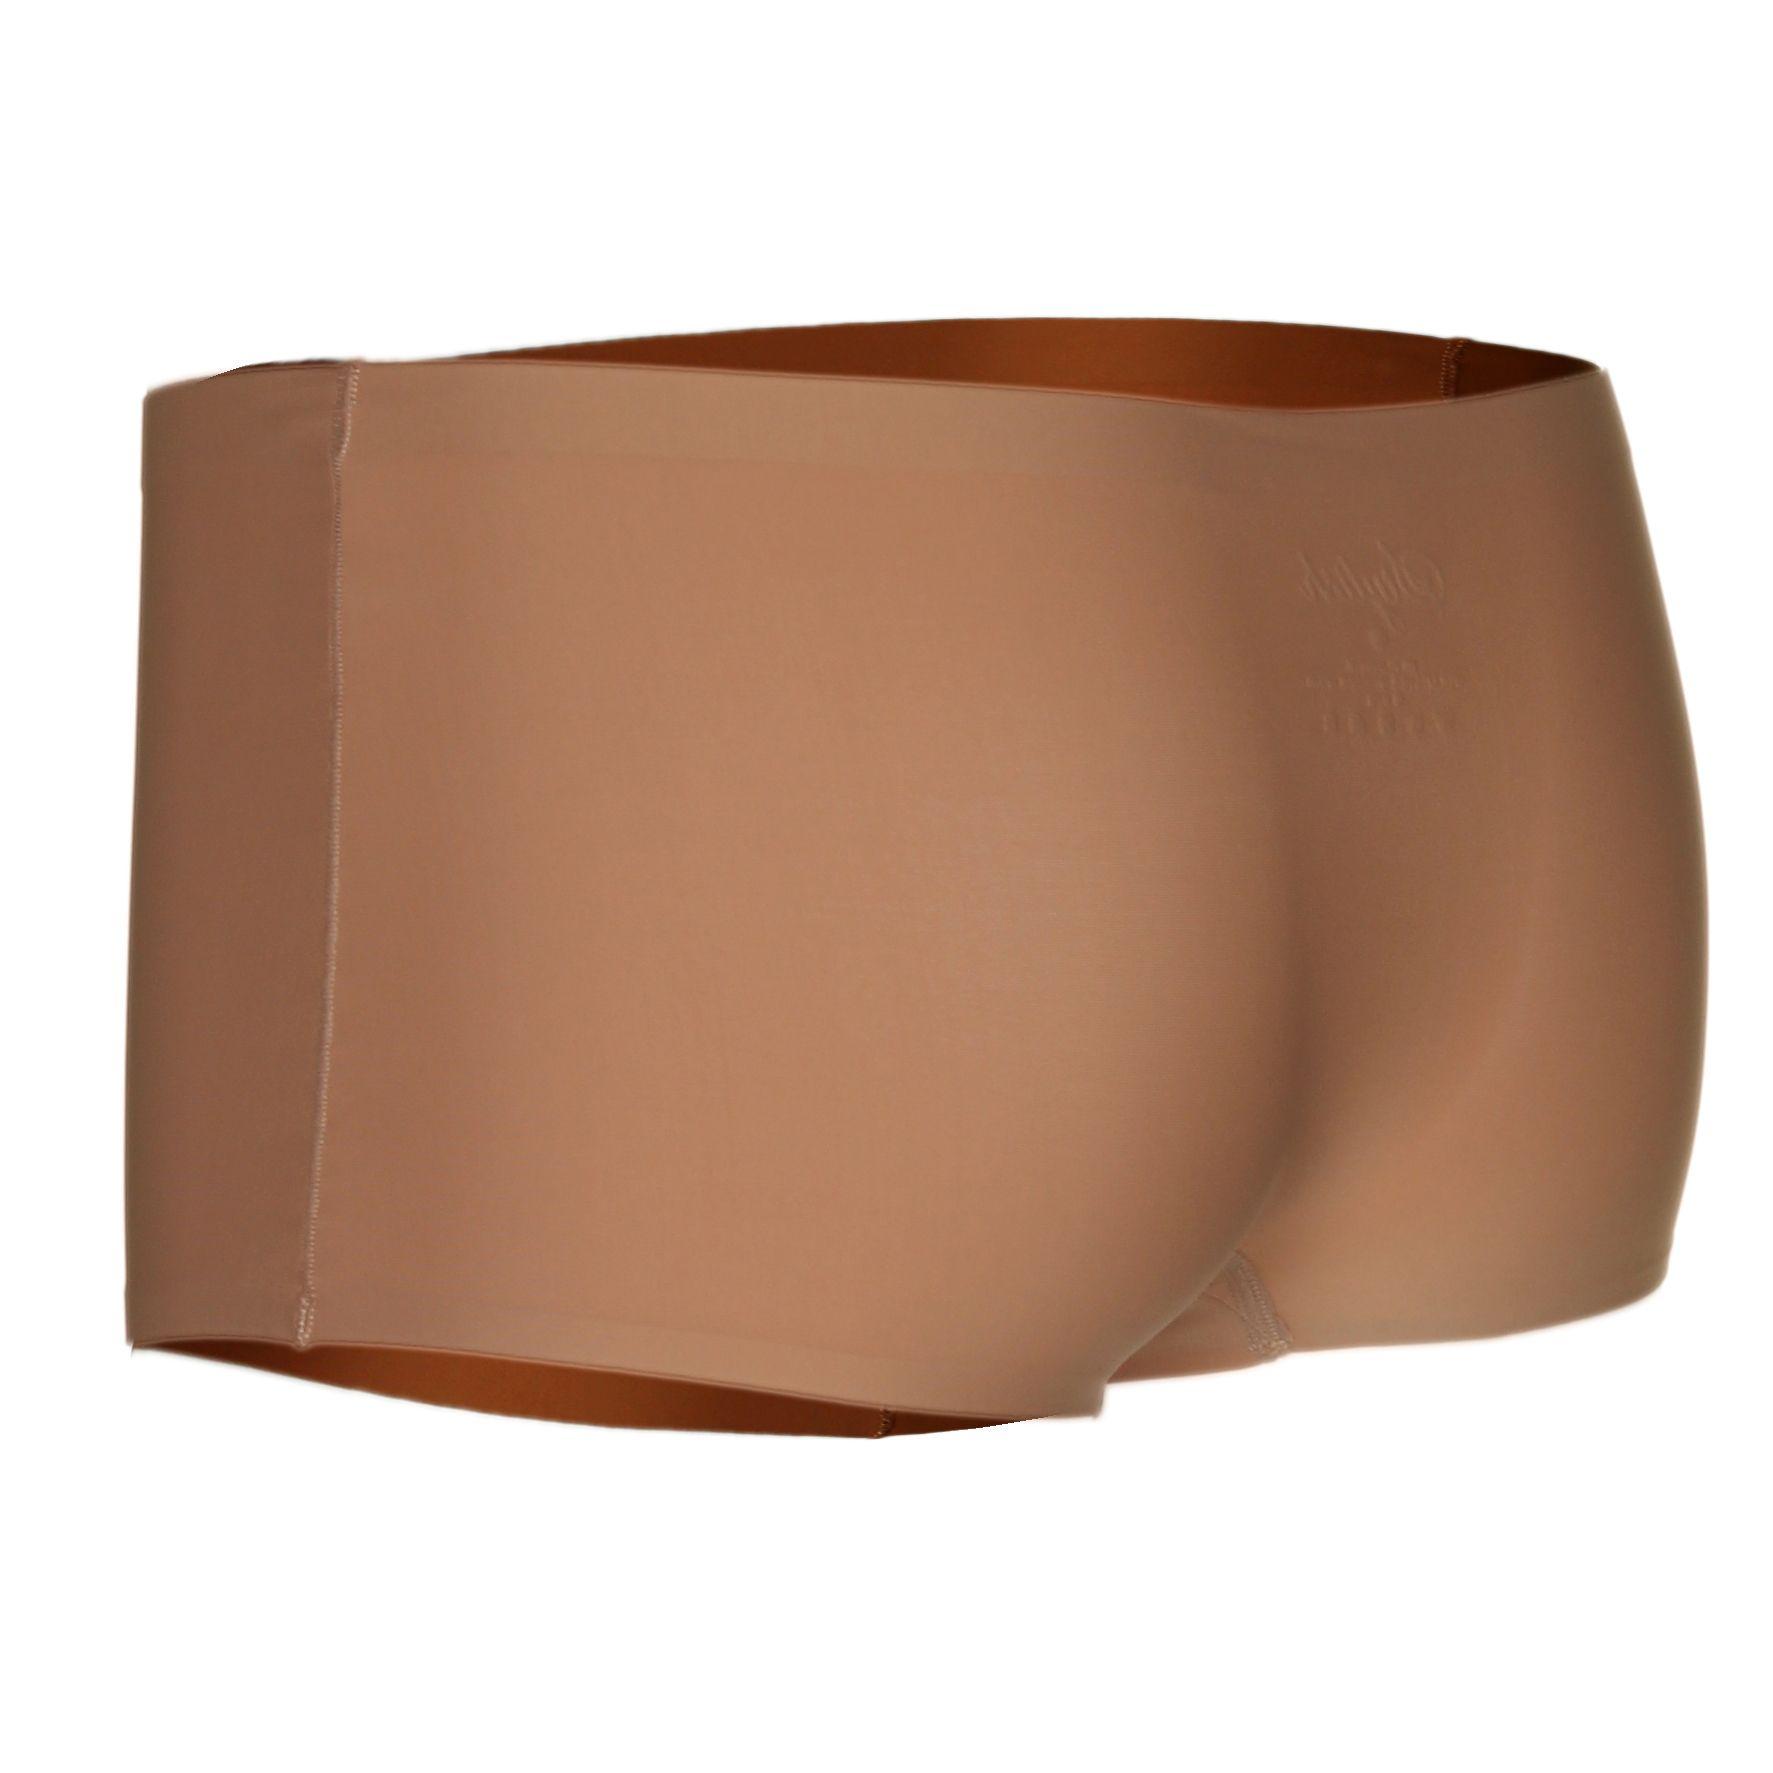 2c7e69f5e91 Emmalise Womens Sexy Hipster Boyshorts Brief Underwear Garment Panty Sexy